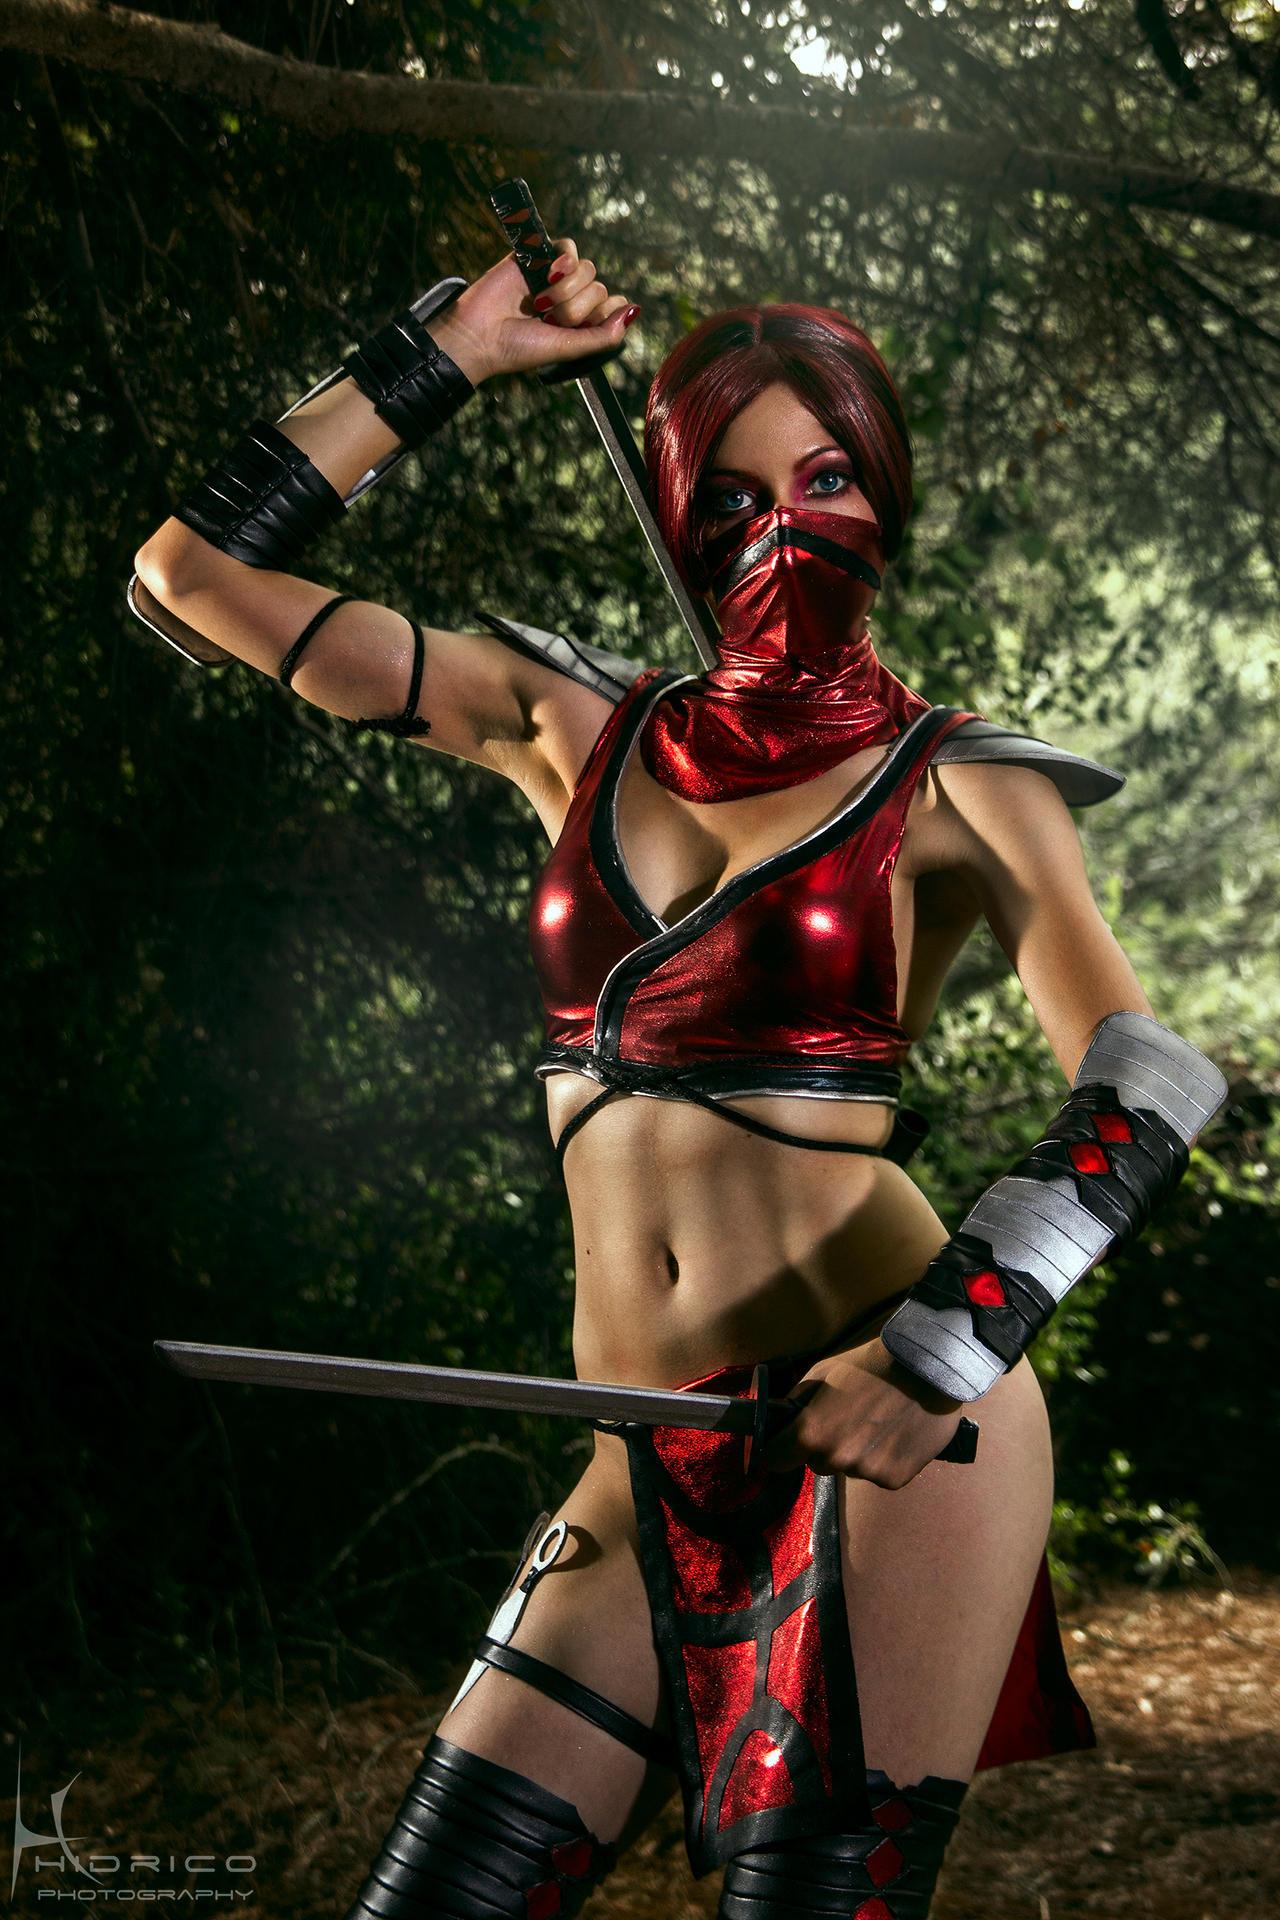 Skarlet - Mortal Kombat 9 - 2 by Hidrico